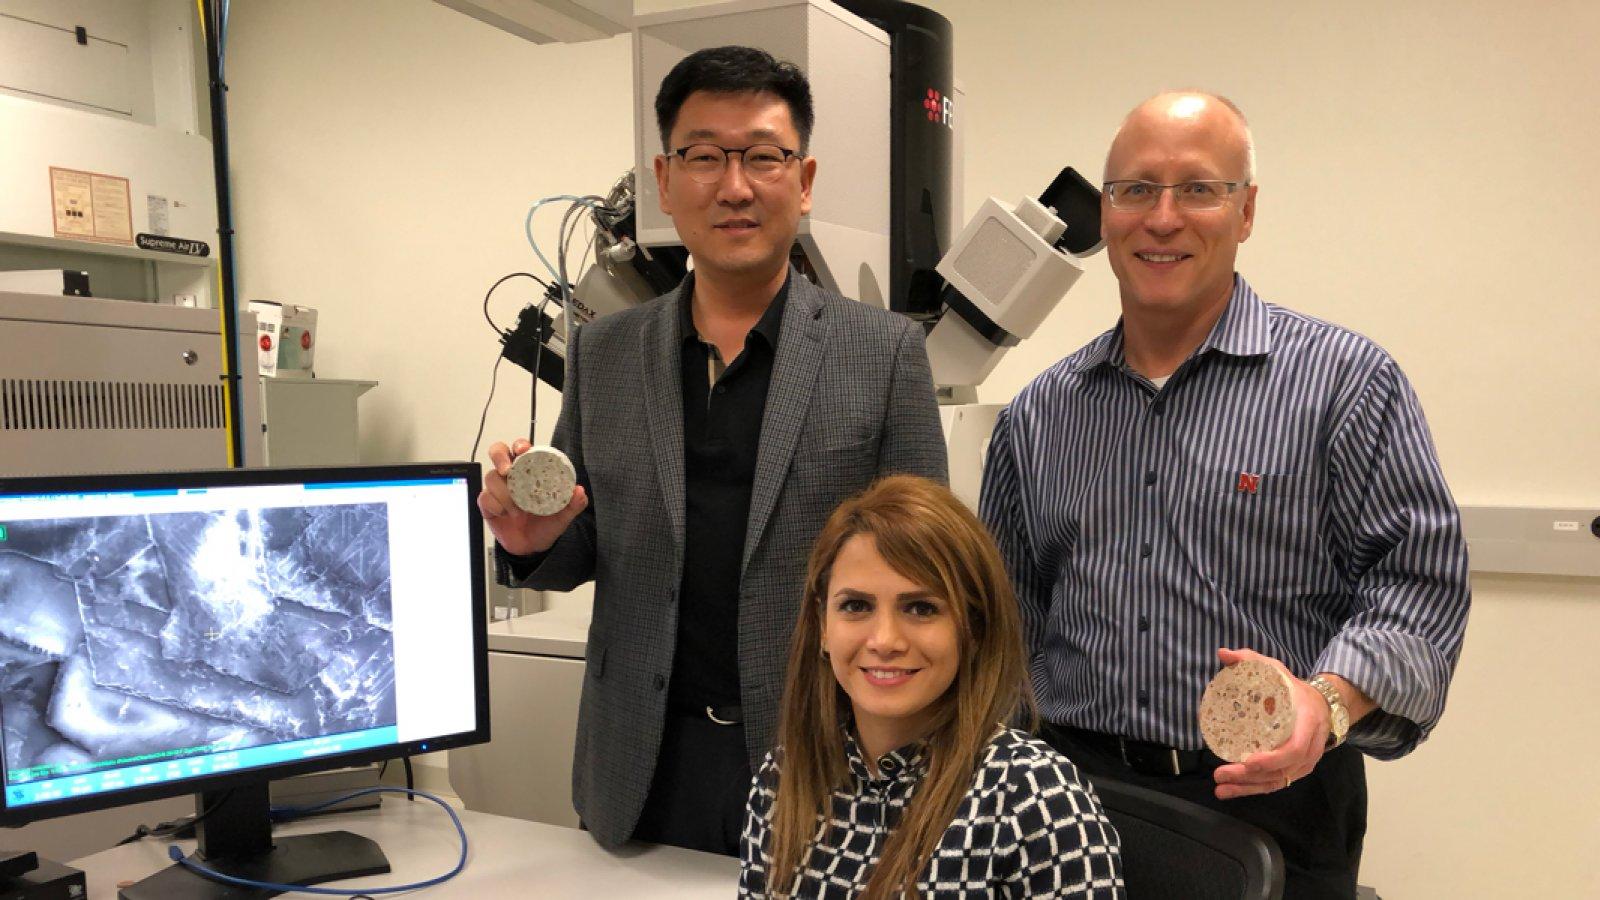 Drs. Yong-Rak Kim, Joseph Turner, and civil engineering graduate student Mahdieh Khedmati.